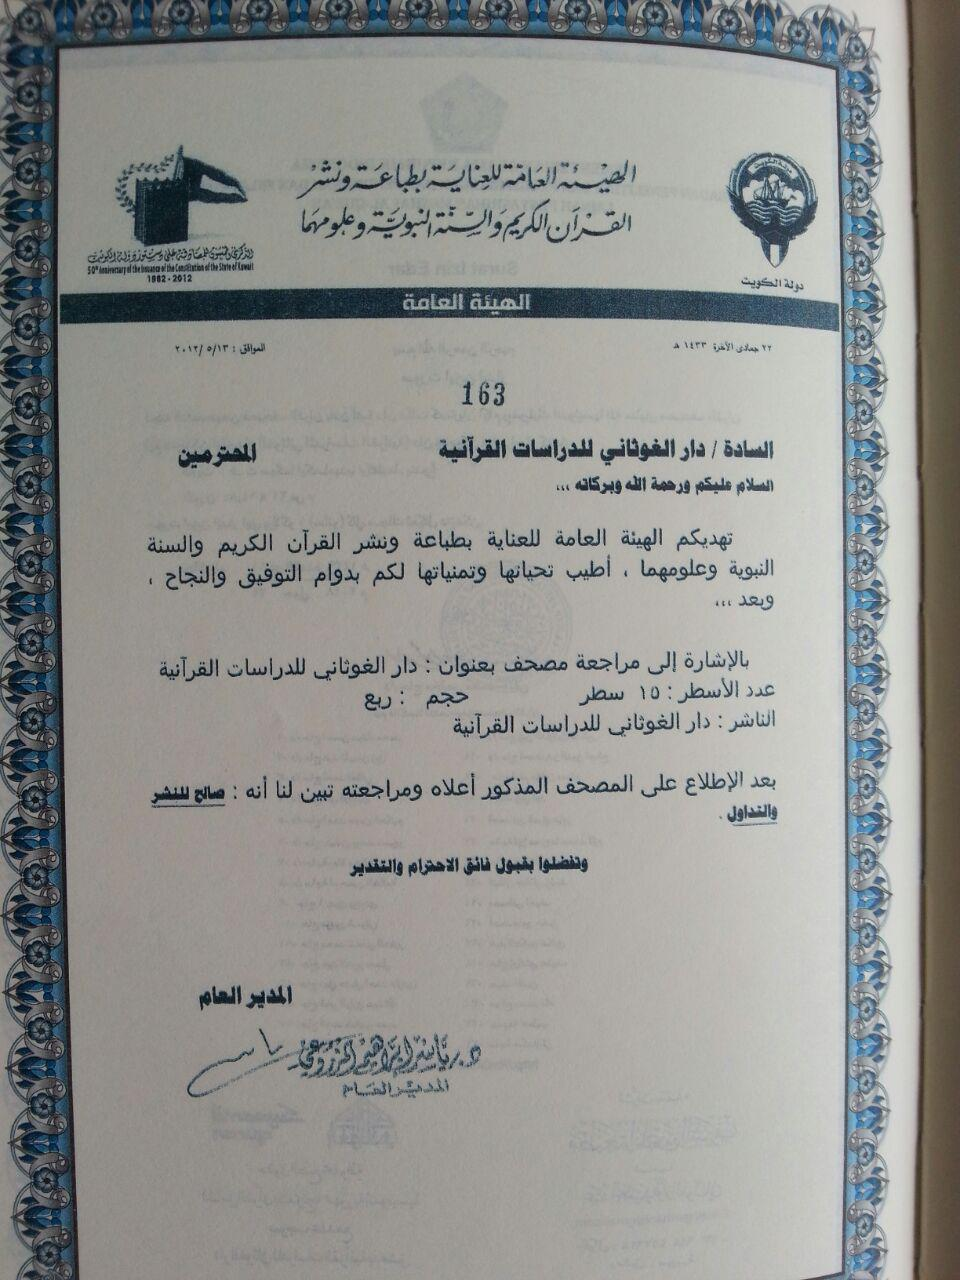 Al-Qur'an Mushaf Khat Standar Madinah Tanpa Terjemah A5 isi